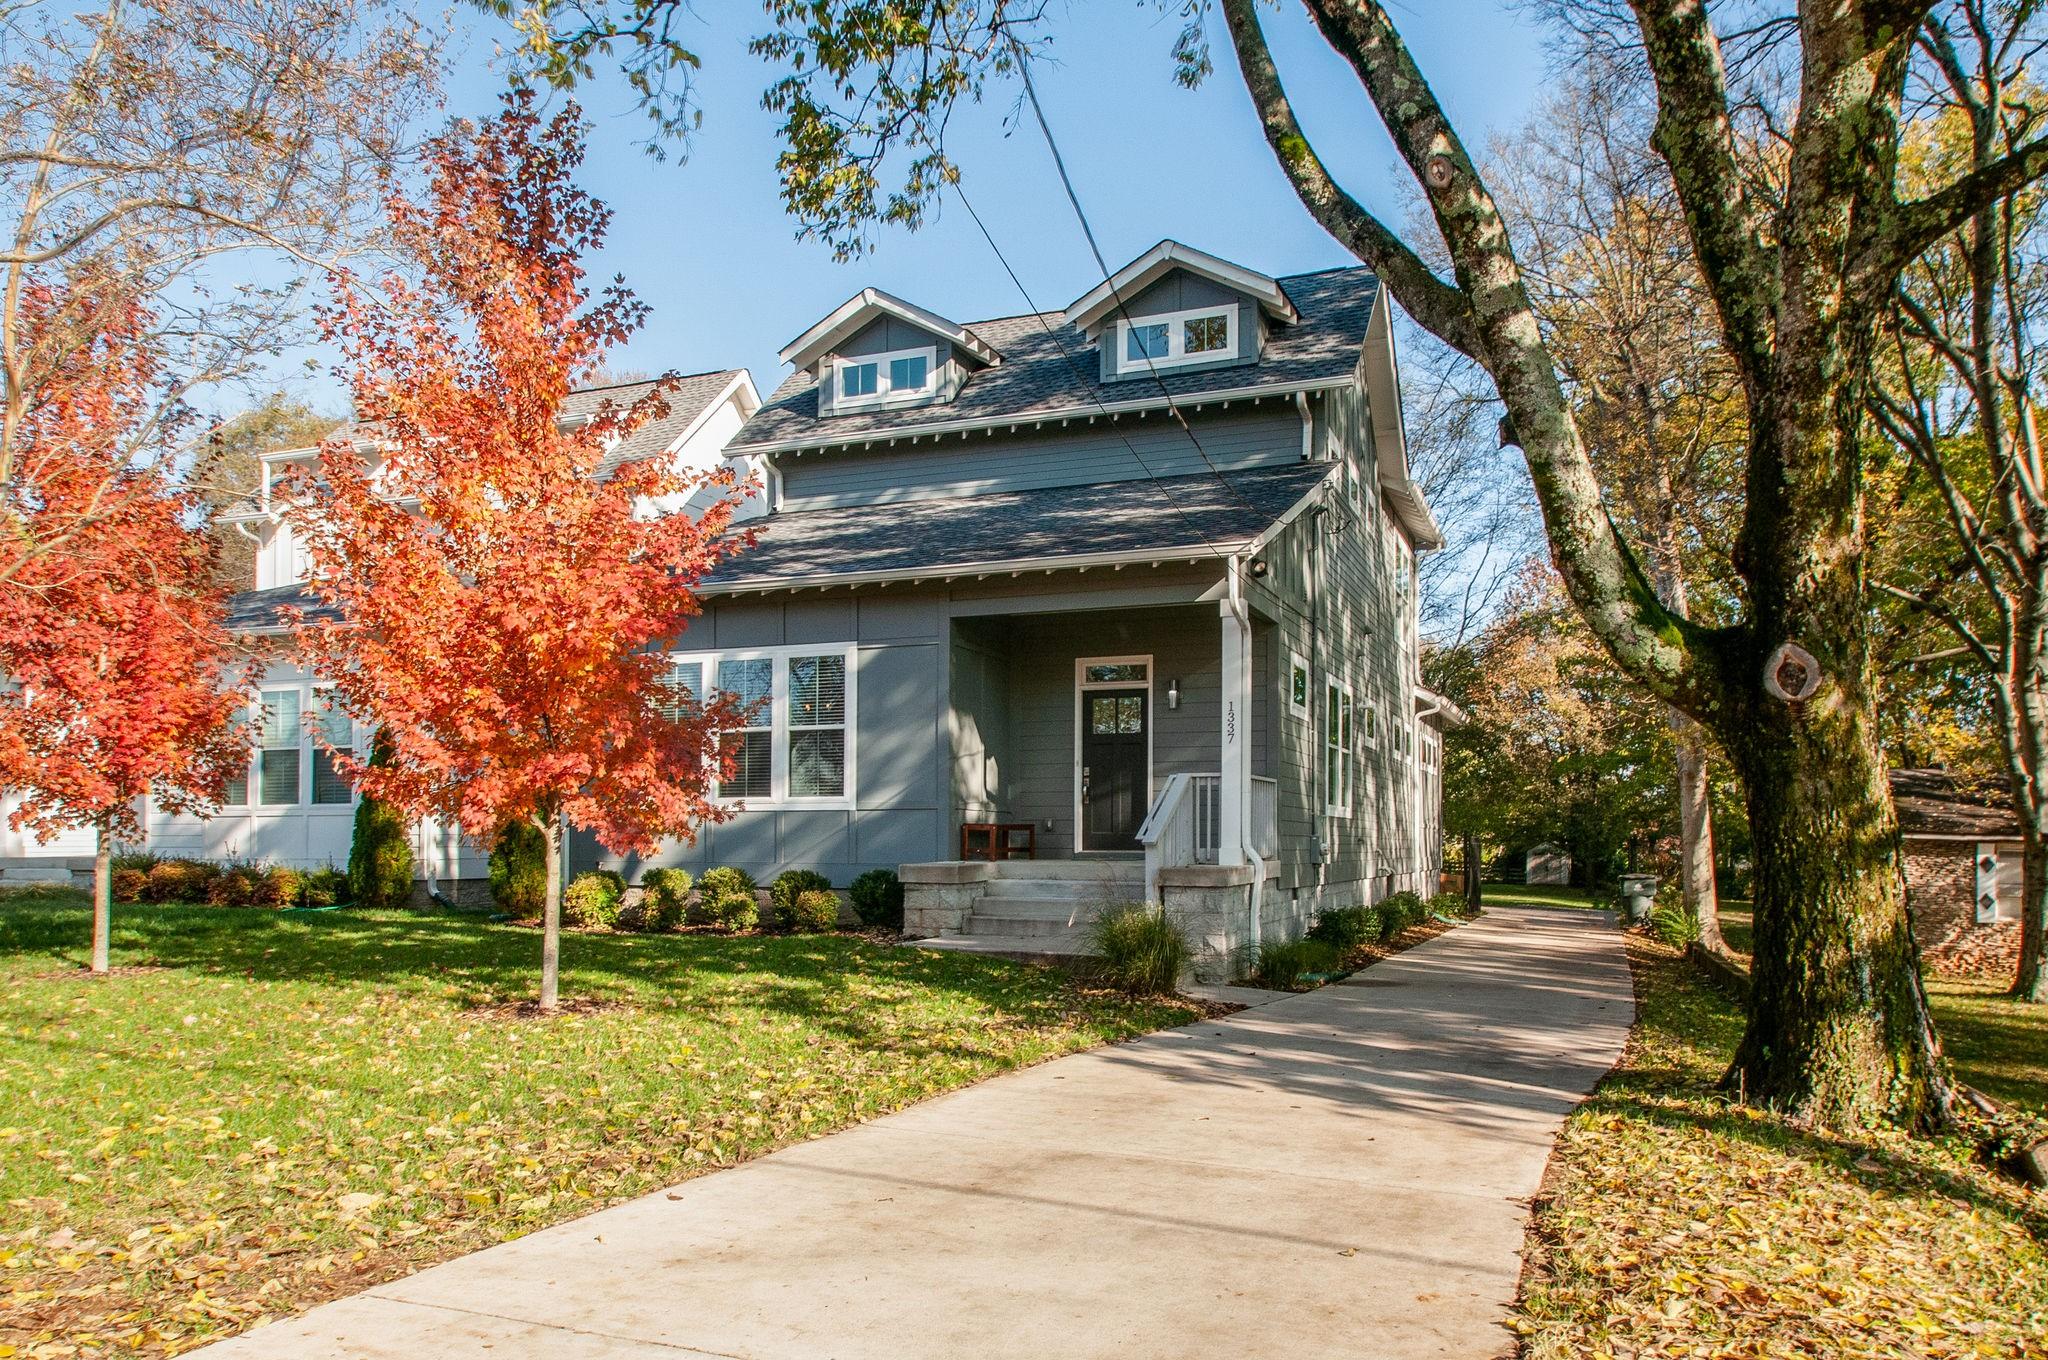 1337 McAlpine Ave, Nashville, TN 37216 - Nashville, TN real estate listing